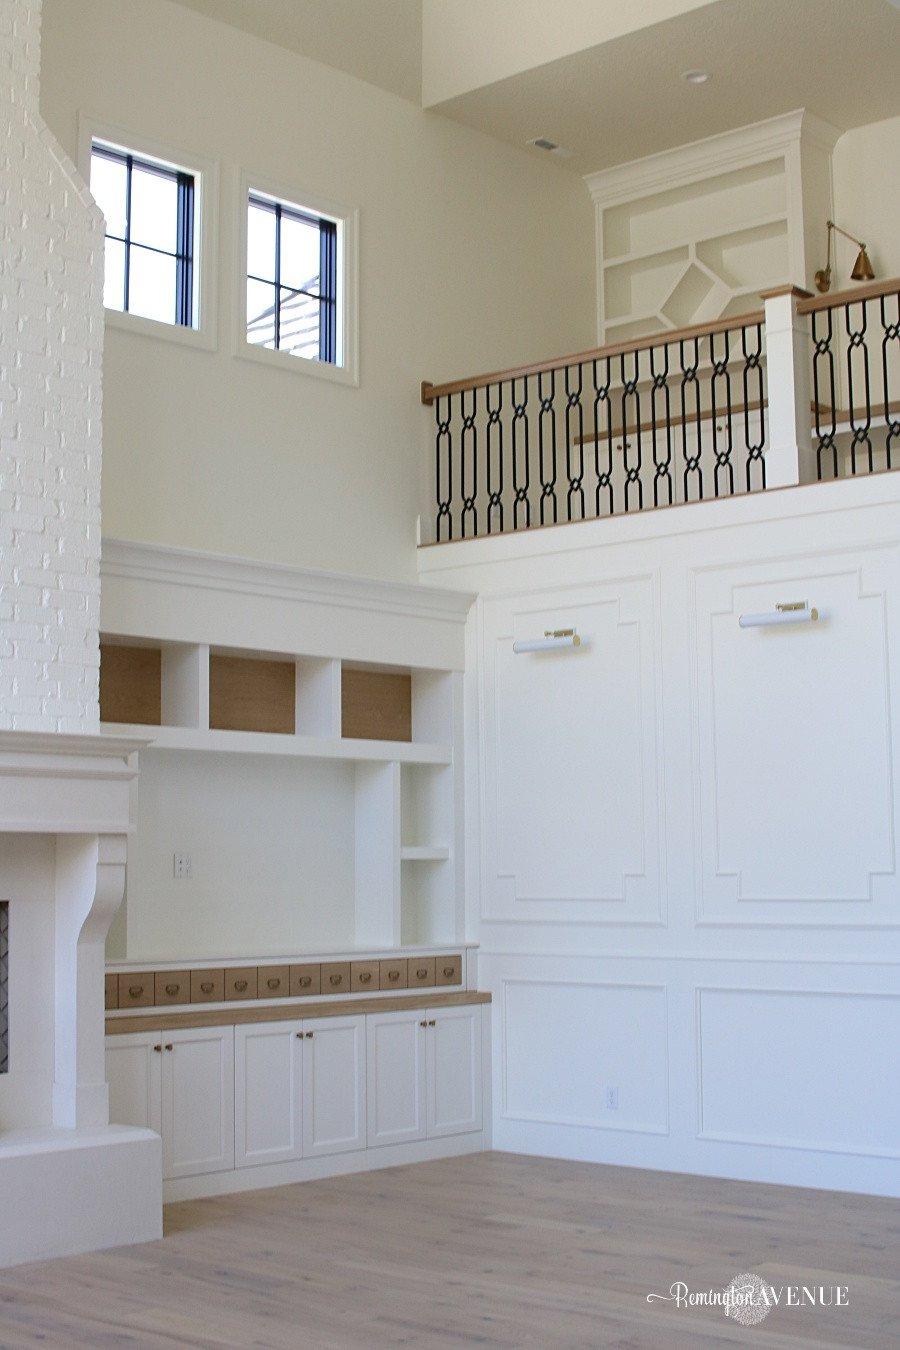 Warm Comfortable Living Room Beautiful Creating A Warm and fortable Living Room Remington Avenue